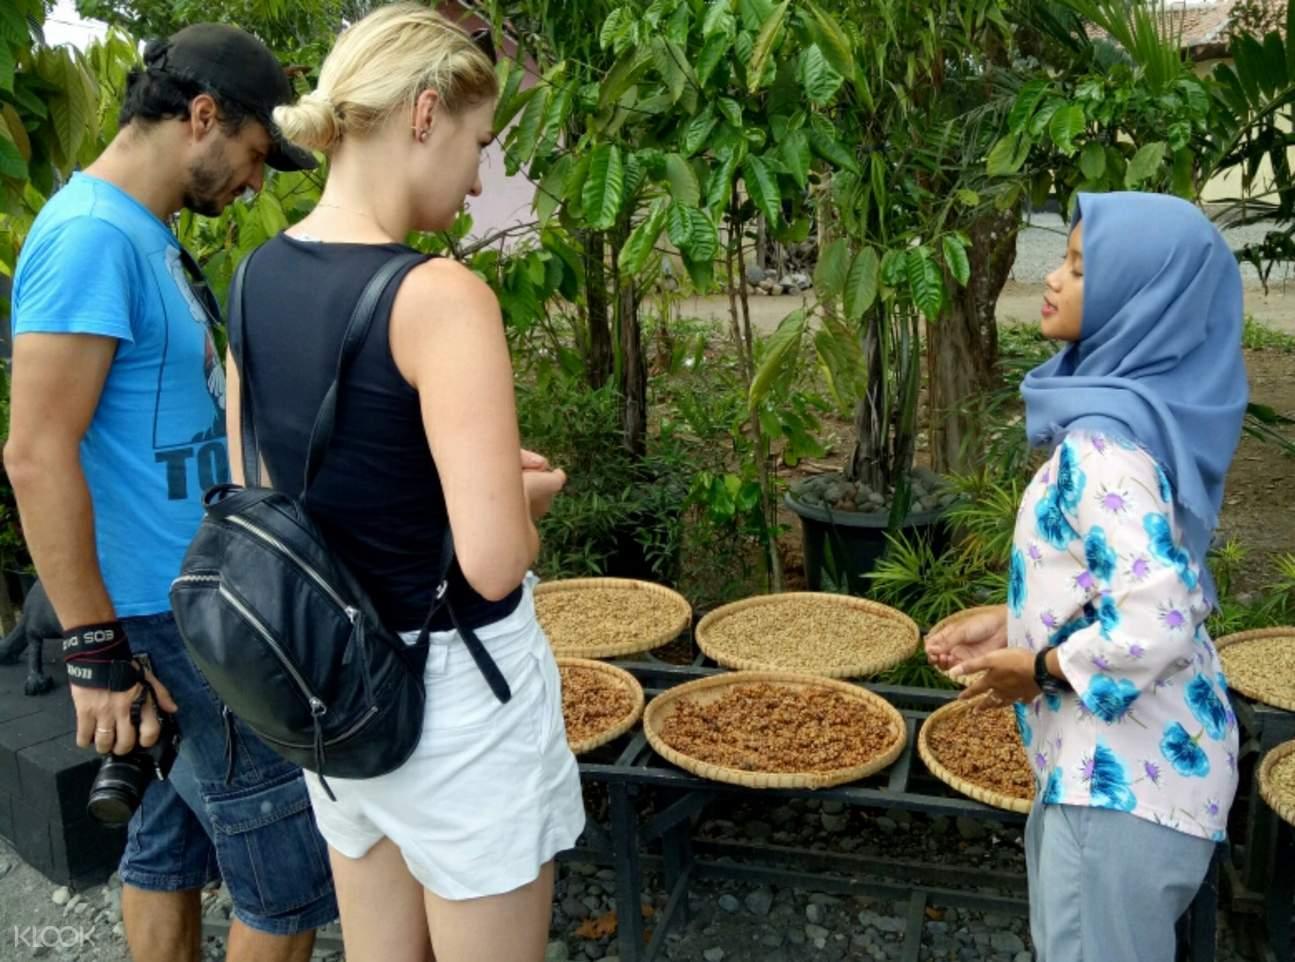 Tourists and vendor in Yogyakarta